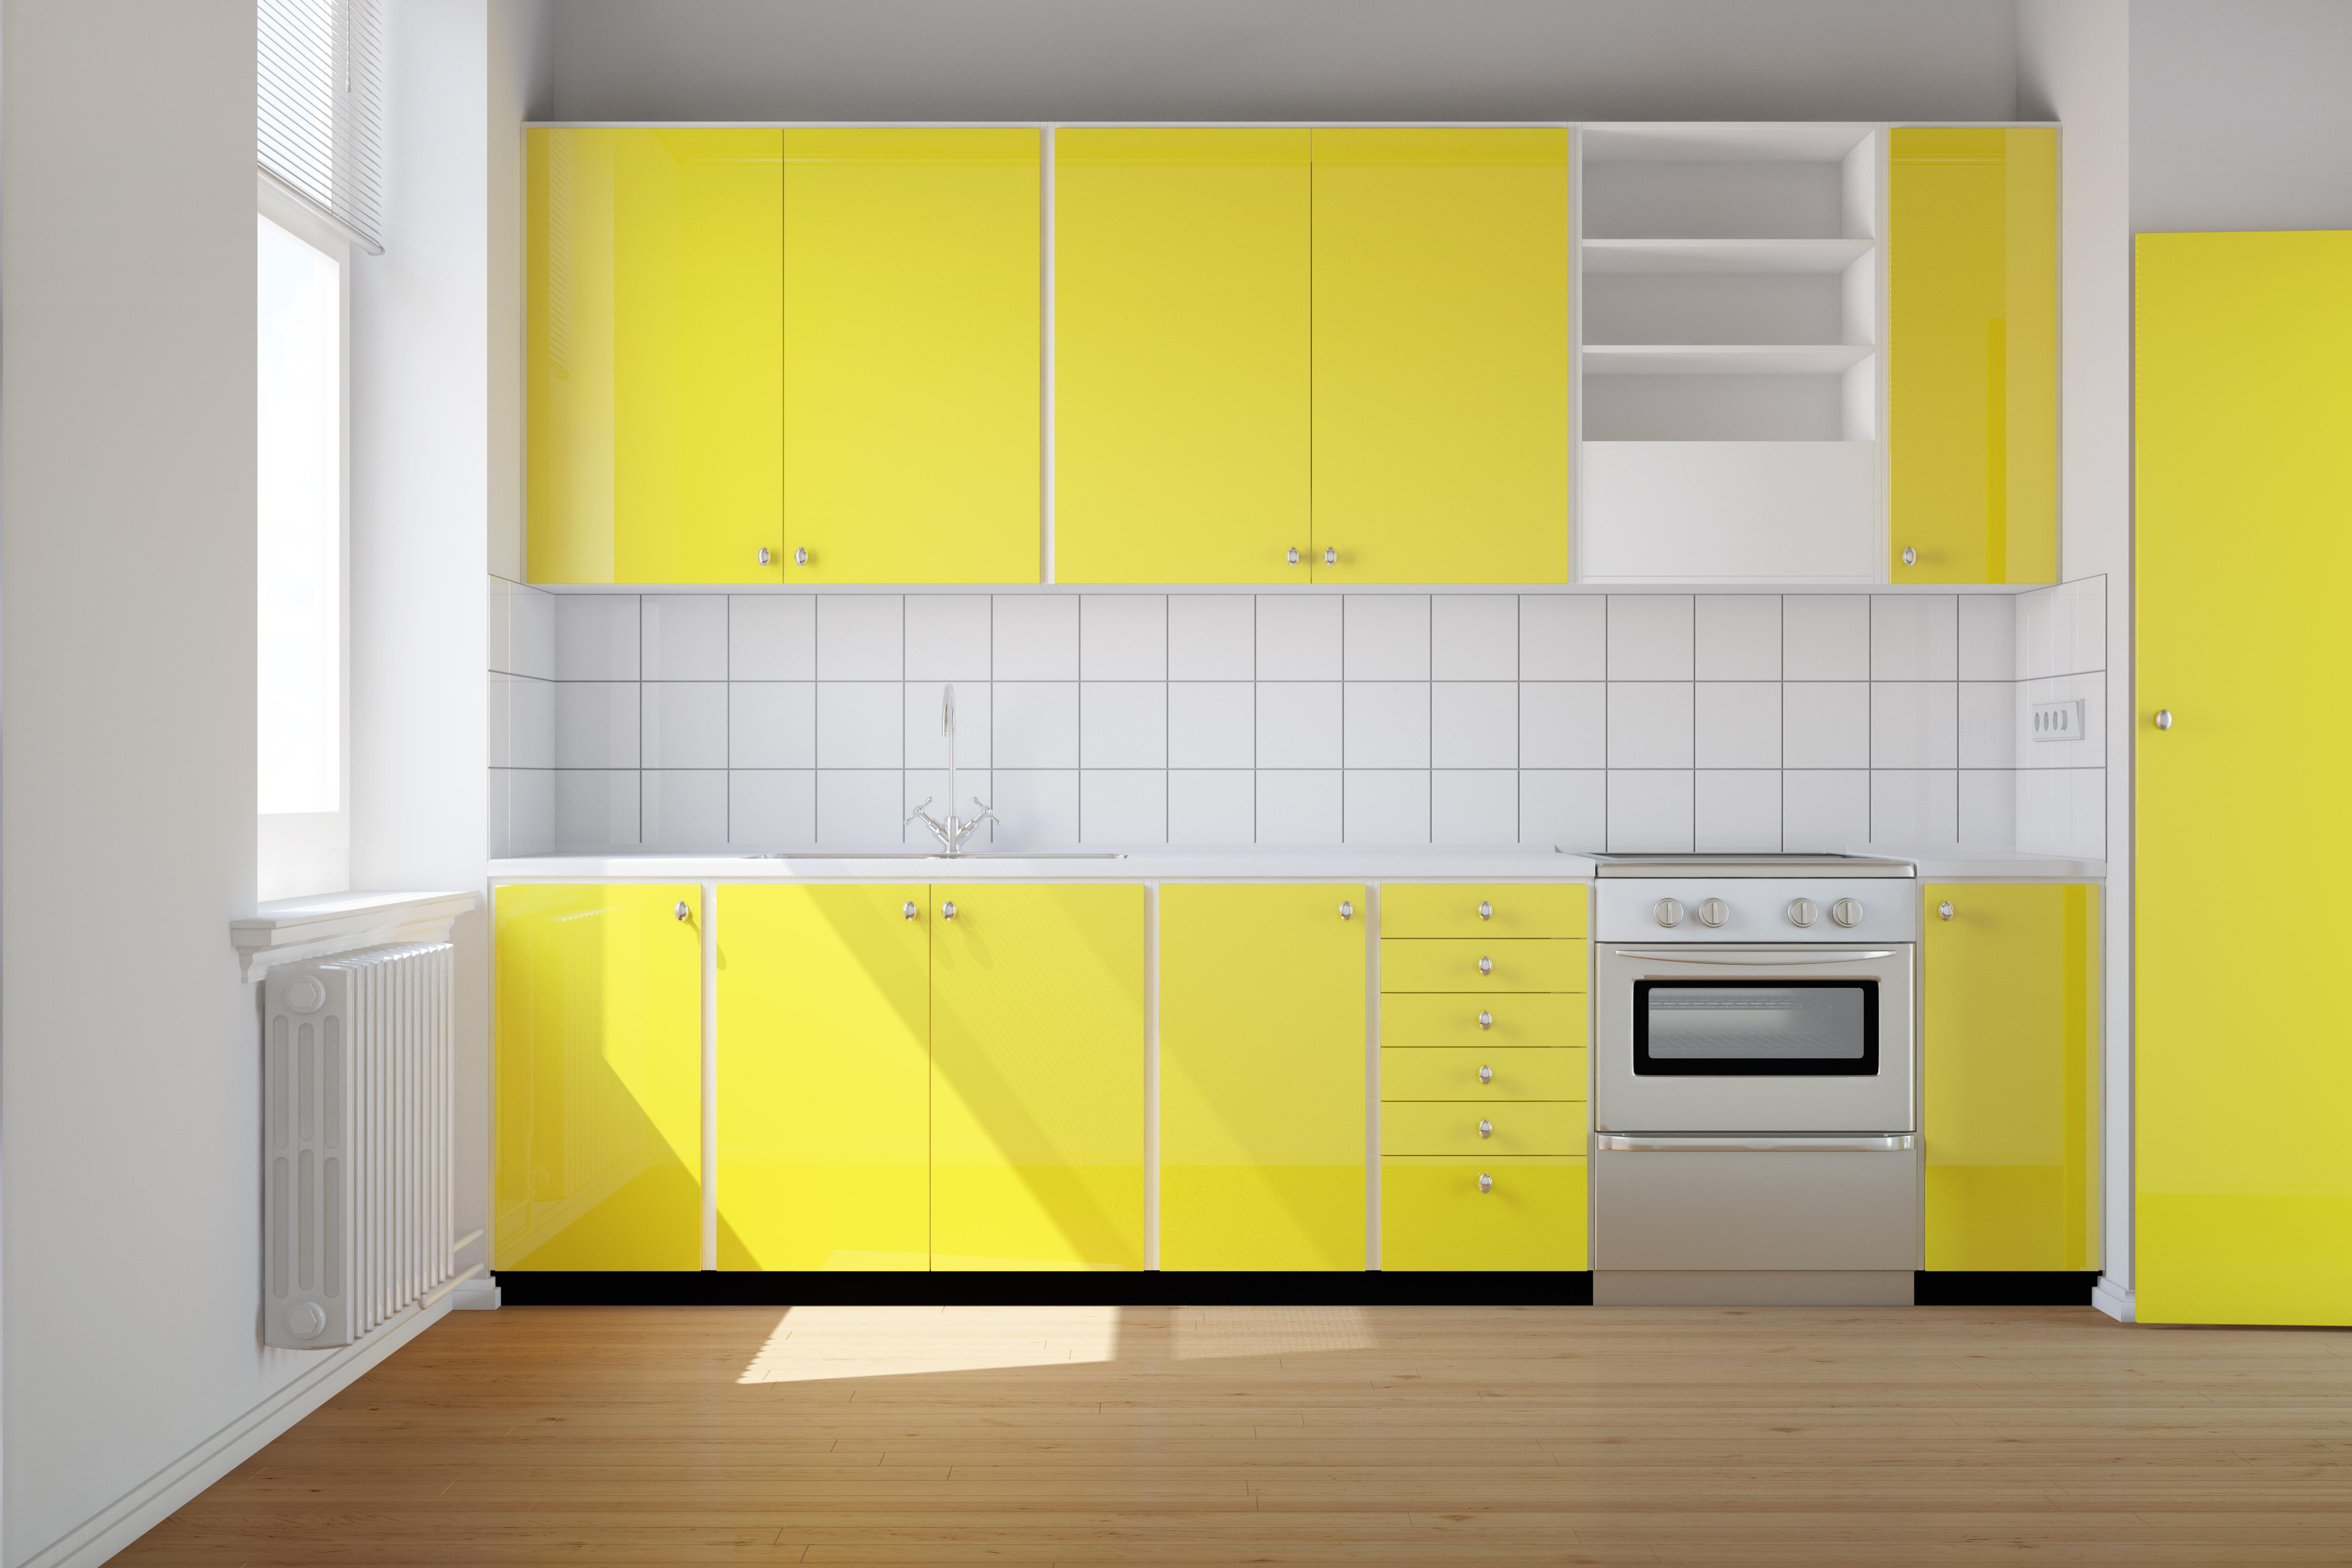 cabinet | kitchen cabinets | cabinet colors | colors | kitchen | kitchen cabinet colors